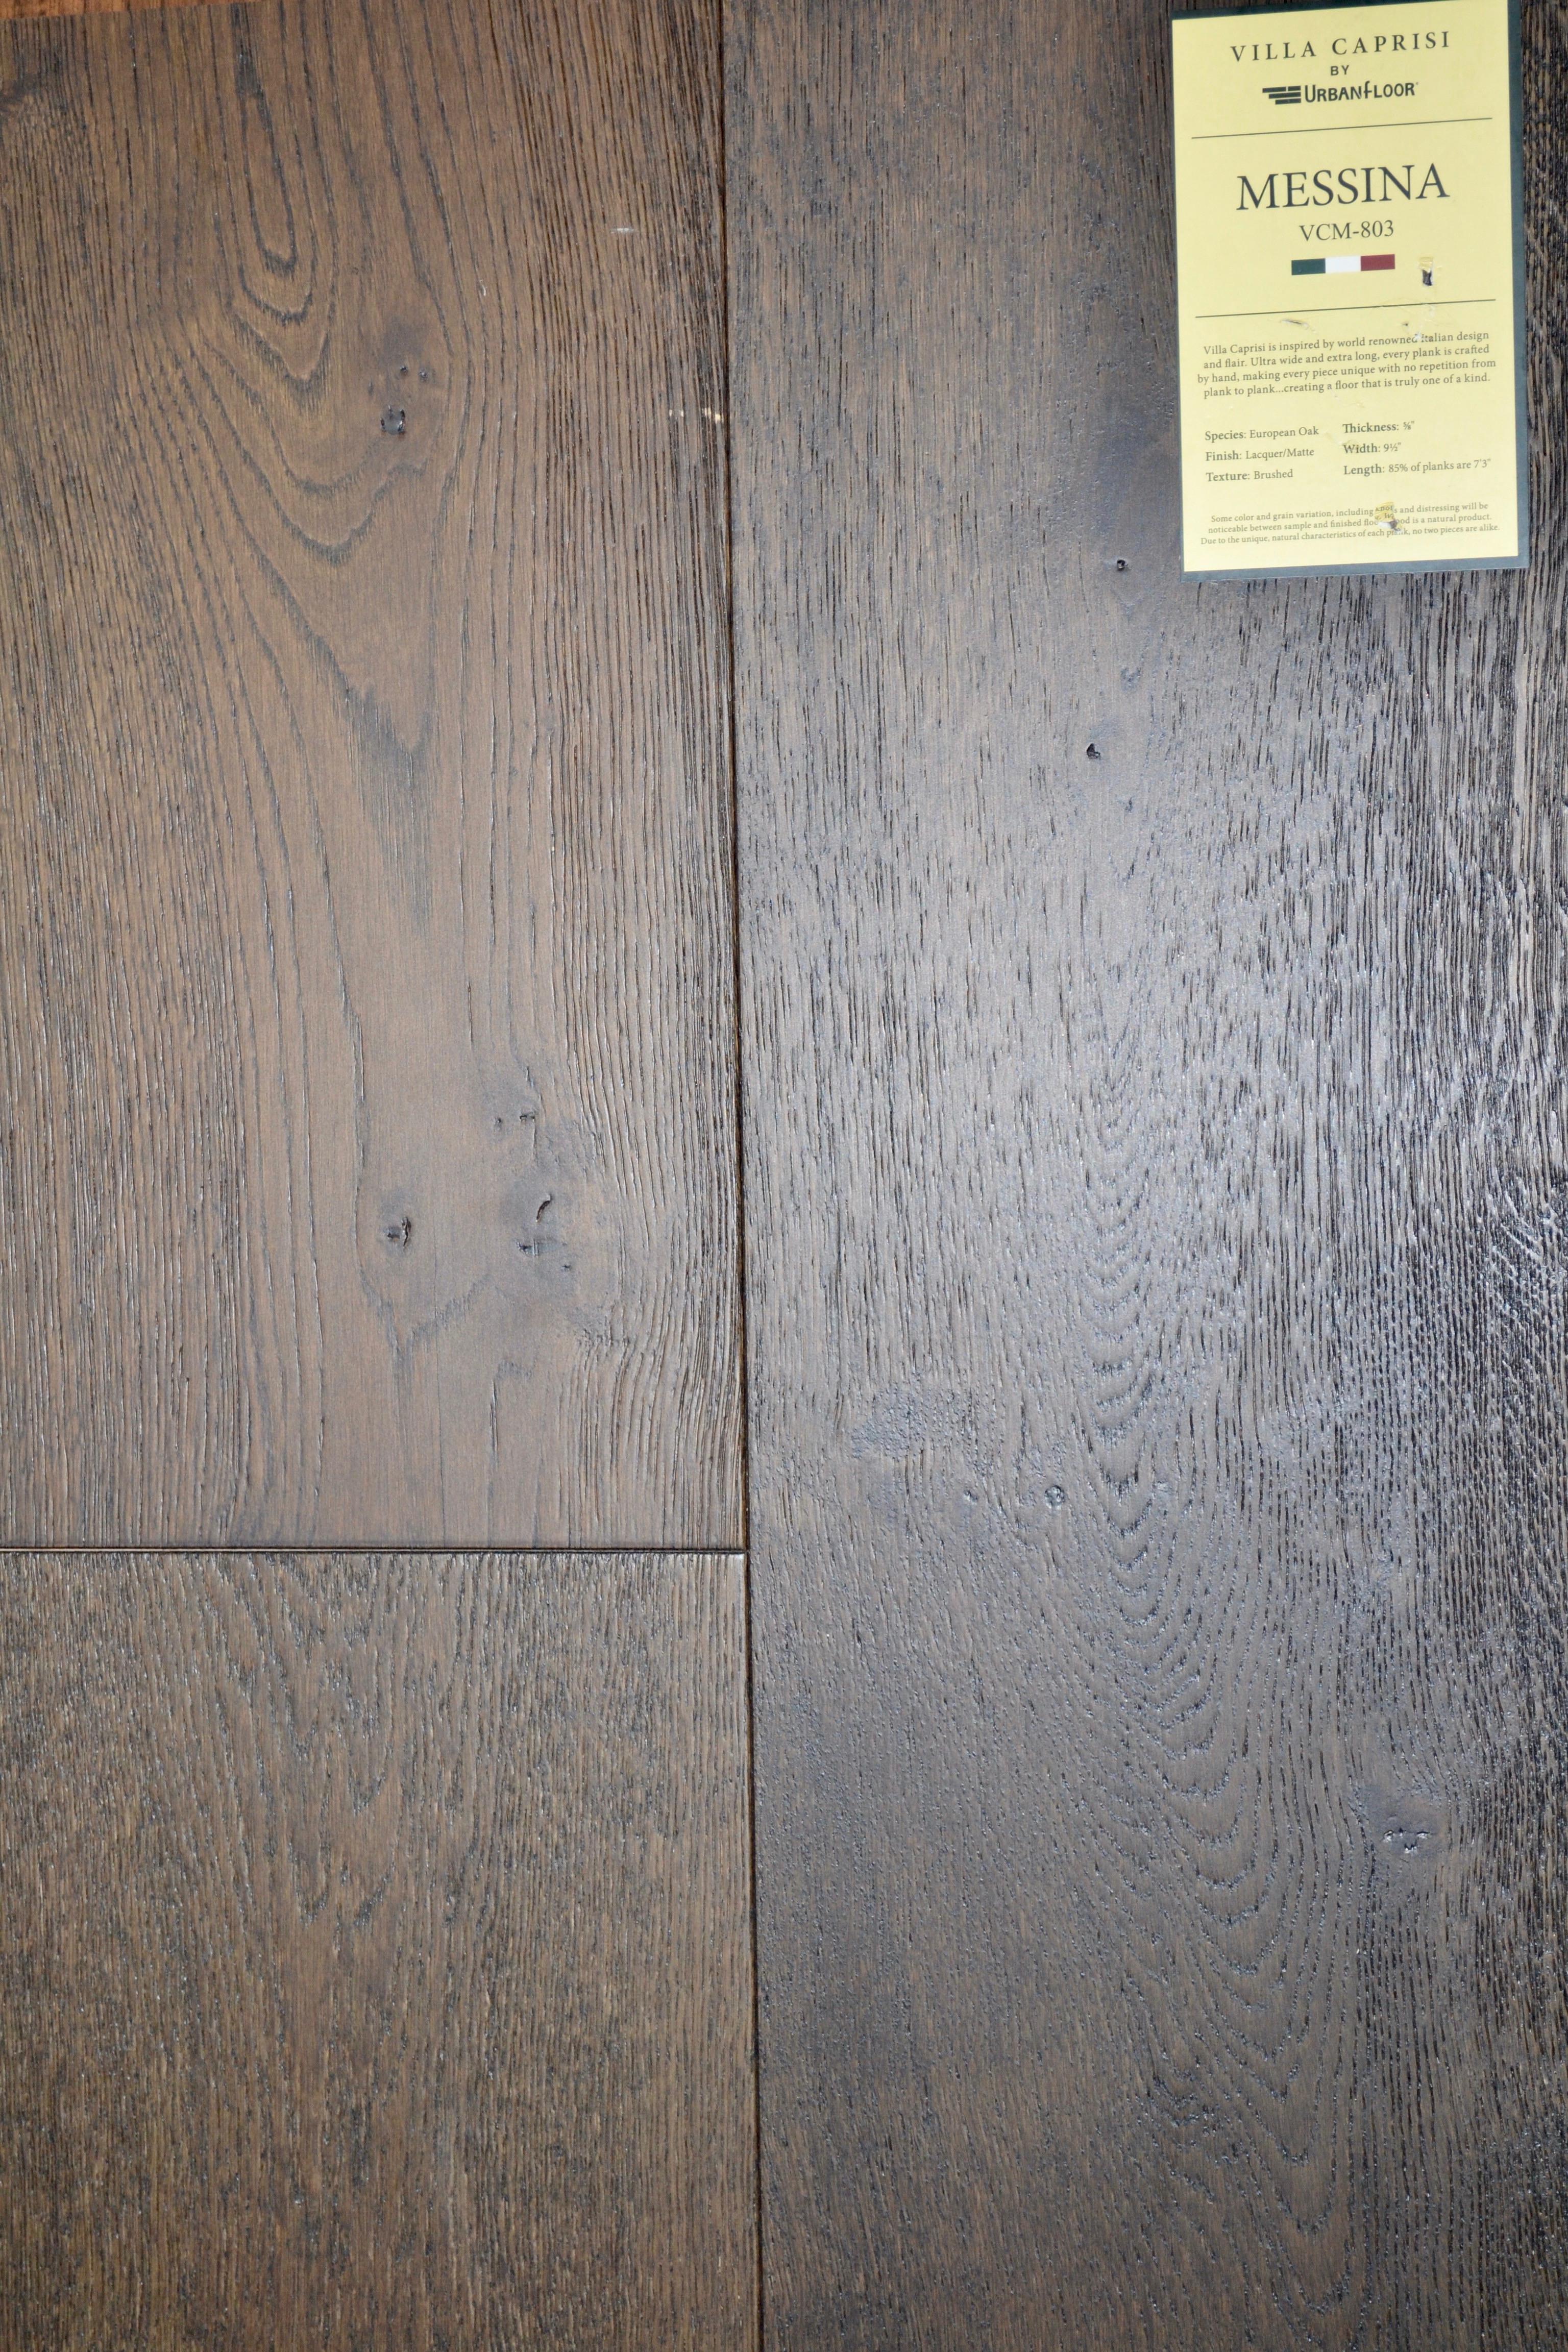 hardwood flooring types pets of villa caprisi fine european hardwood millennium hardwood with european style inspired designer oak floor messina by villa caprisi